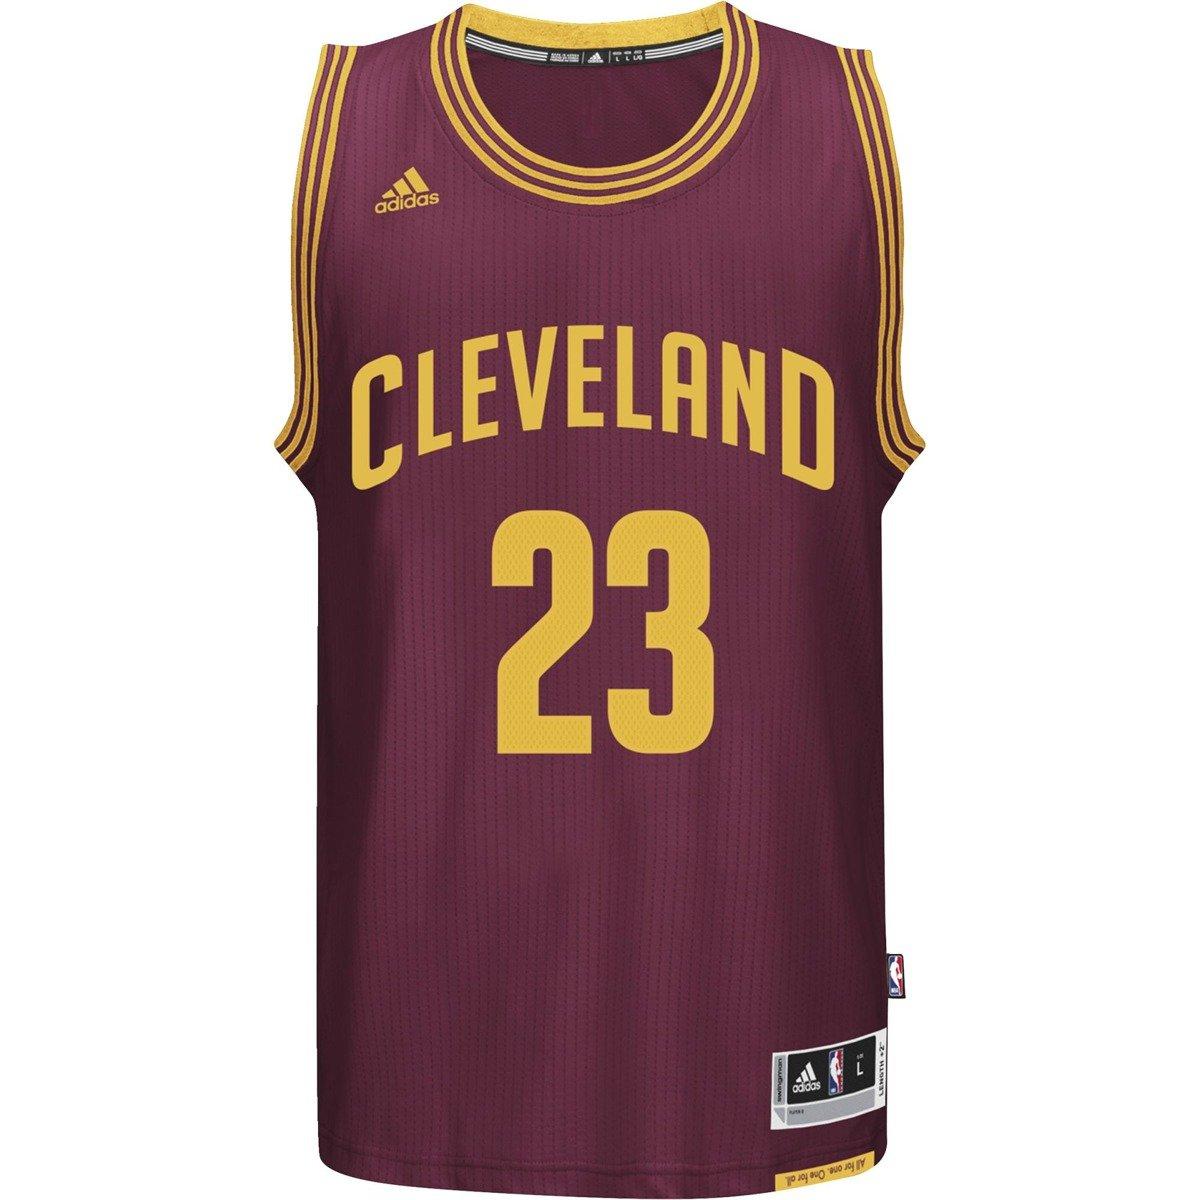 d1fc2a8e7 ukengplAdidas-NBA-Swingman-Cleveland... 23 Swingman LeBron James Cleveland  Cavaliers Jersey - Mens Adidas NBA Navy Blue ...